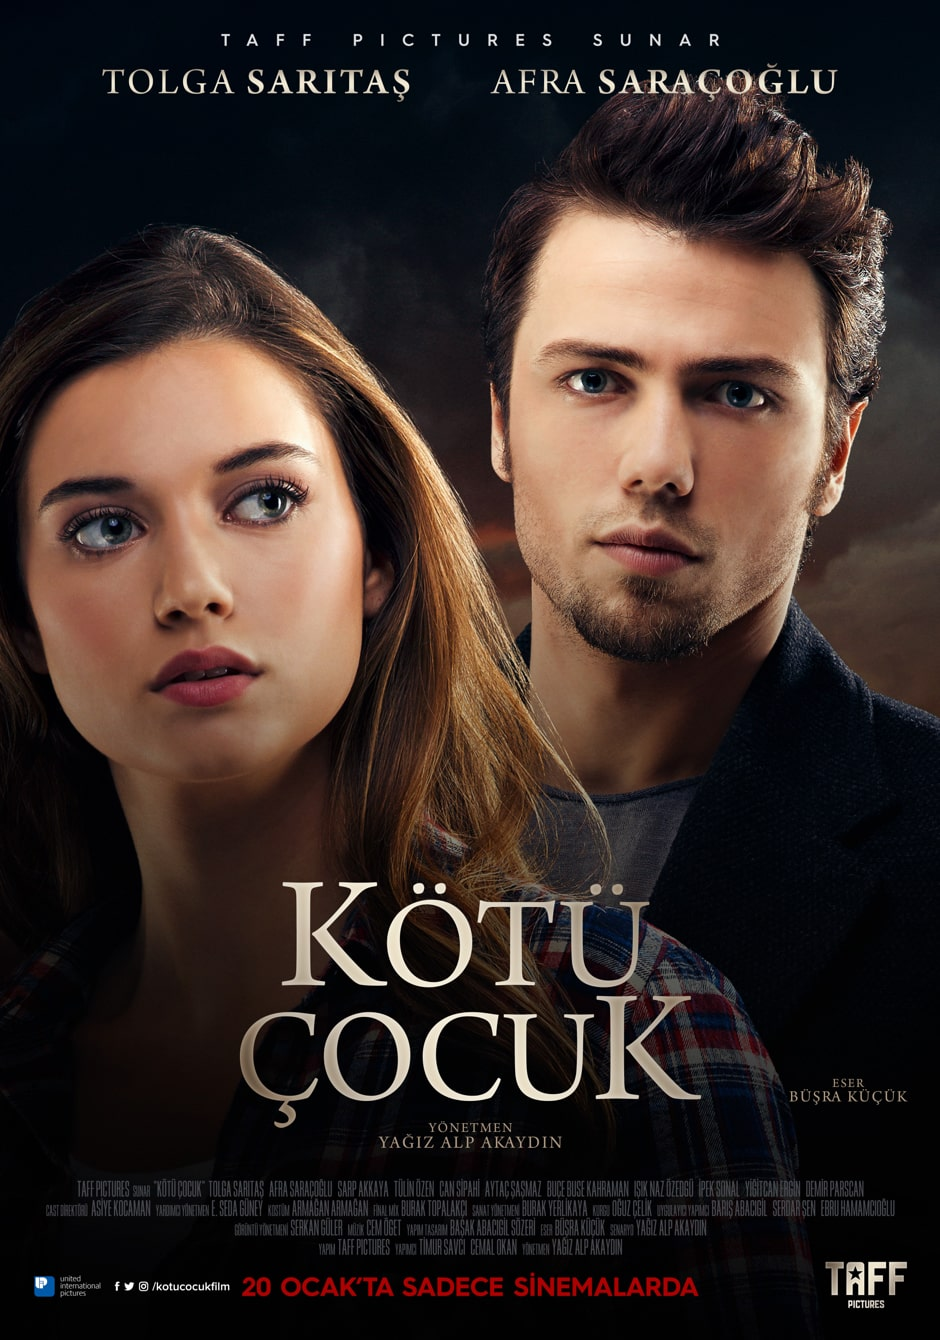 KOTU_COCUK Copy-min